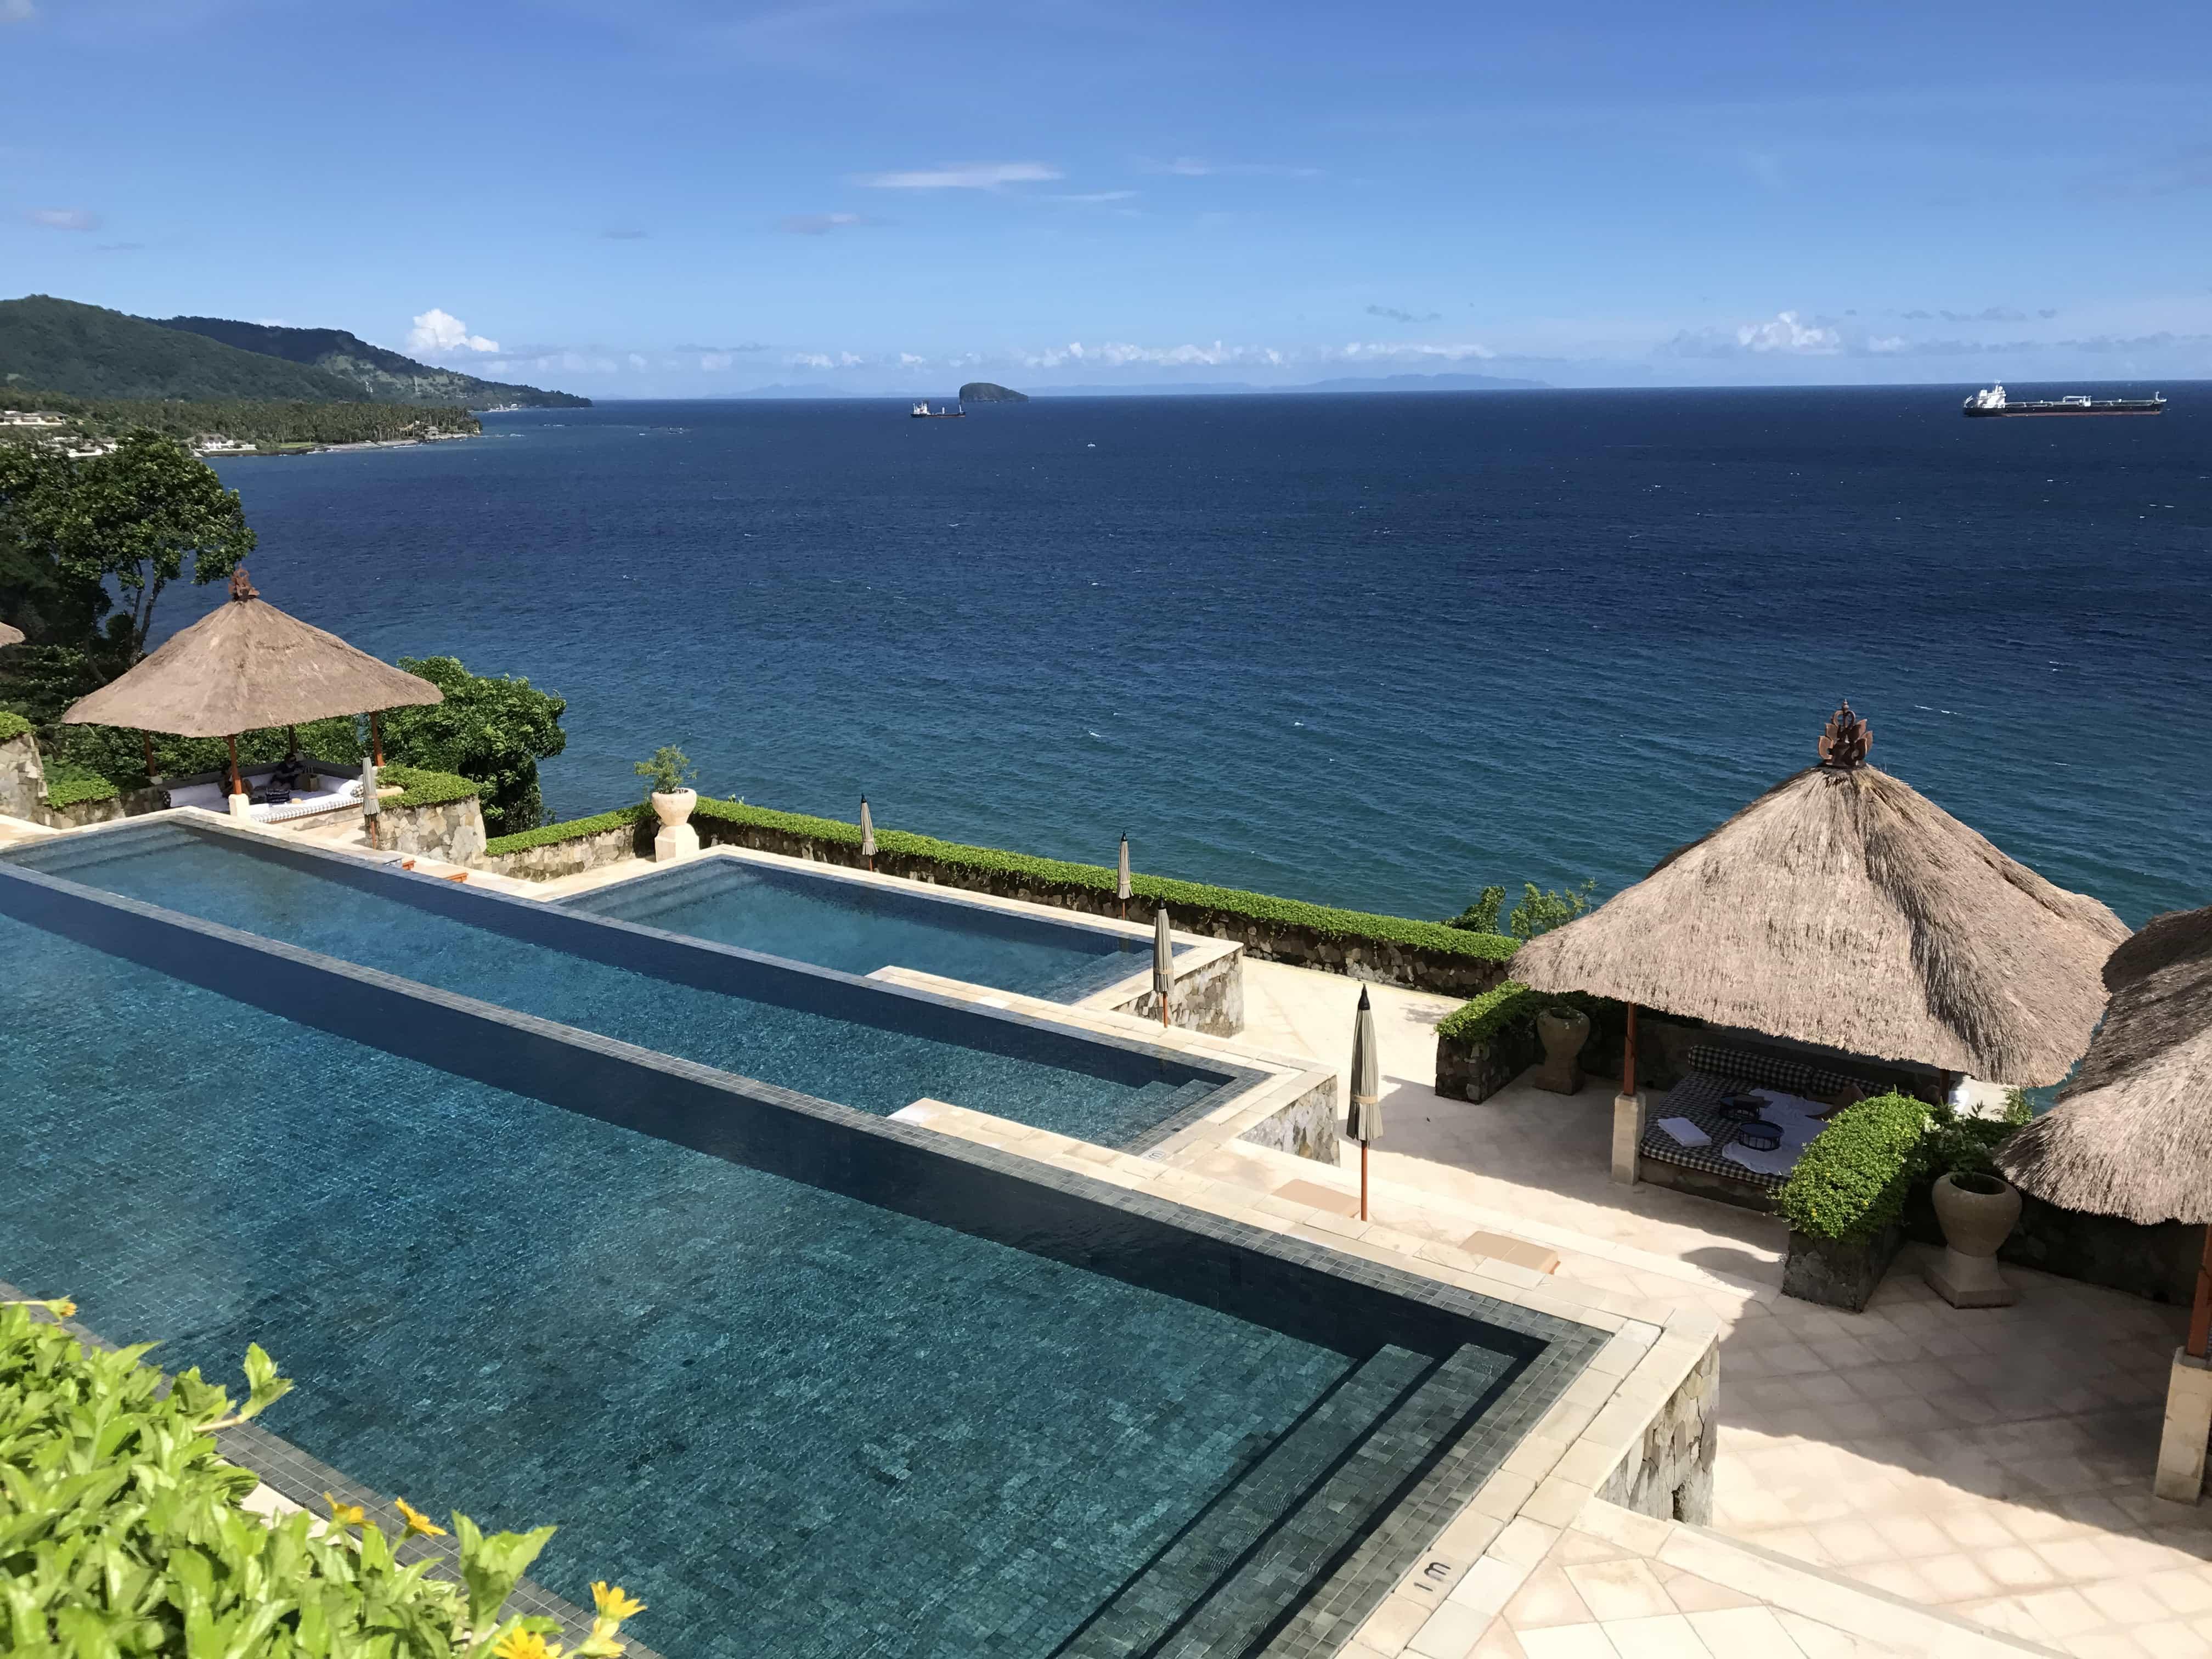 infinity pool overlooking ocean, Bali